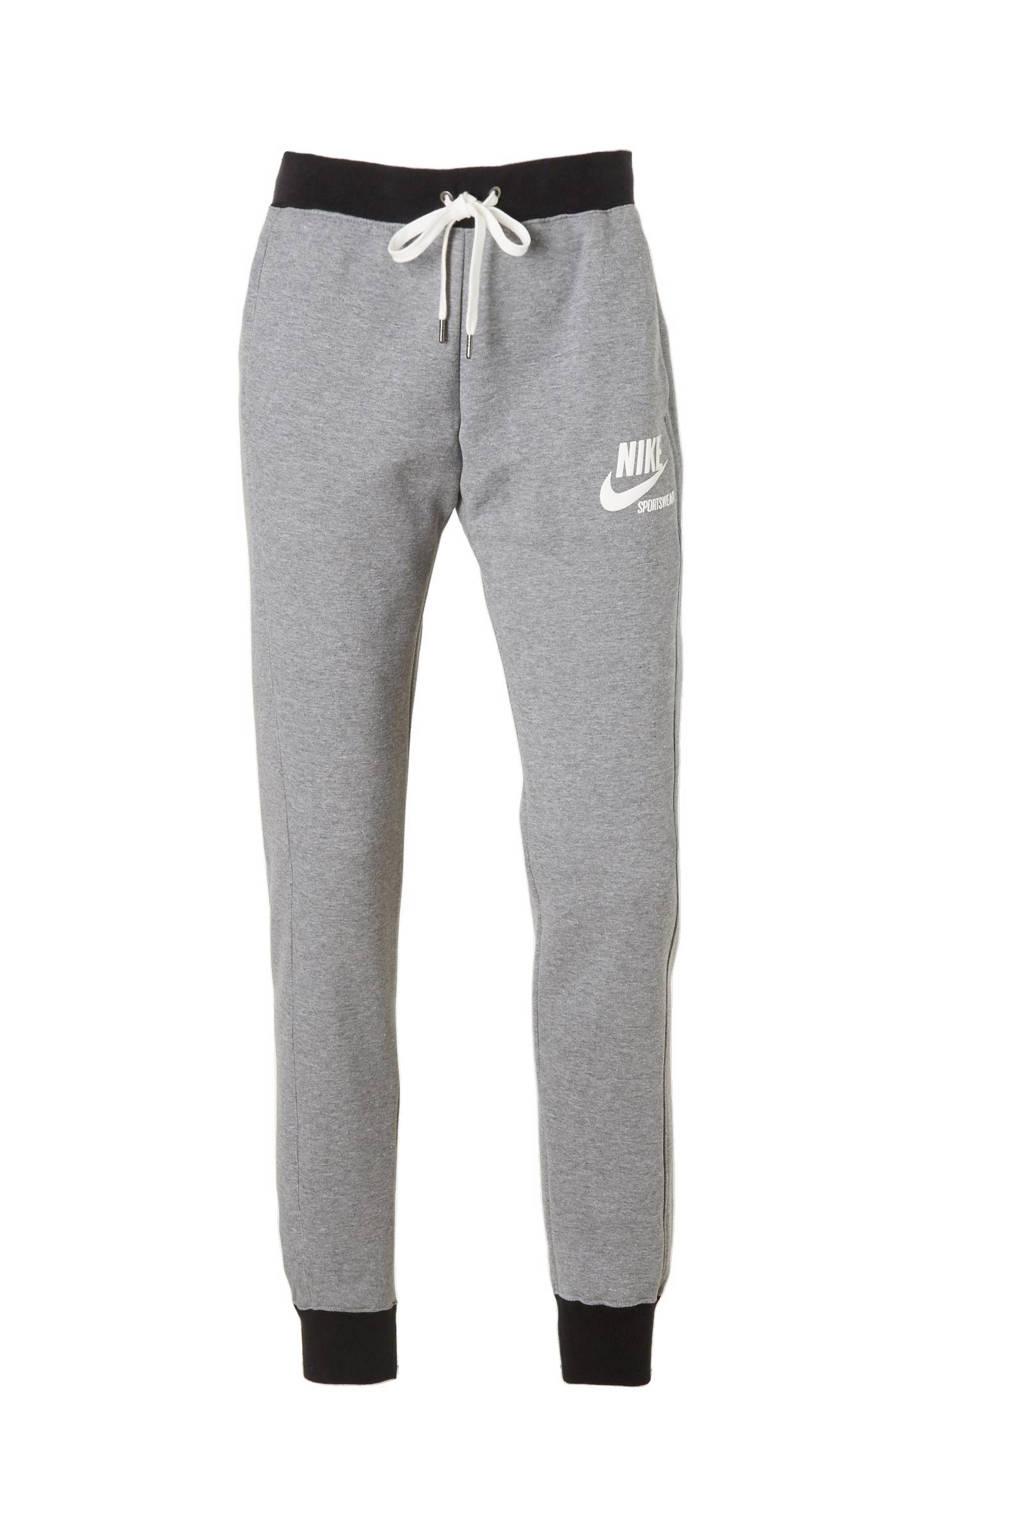 Joggingbroek Grijs Dames.Nike Joggingbroek Wehkamp